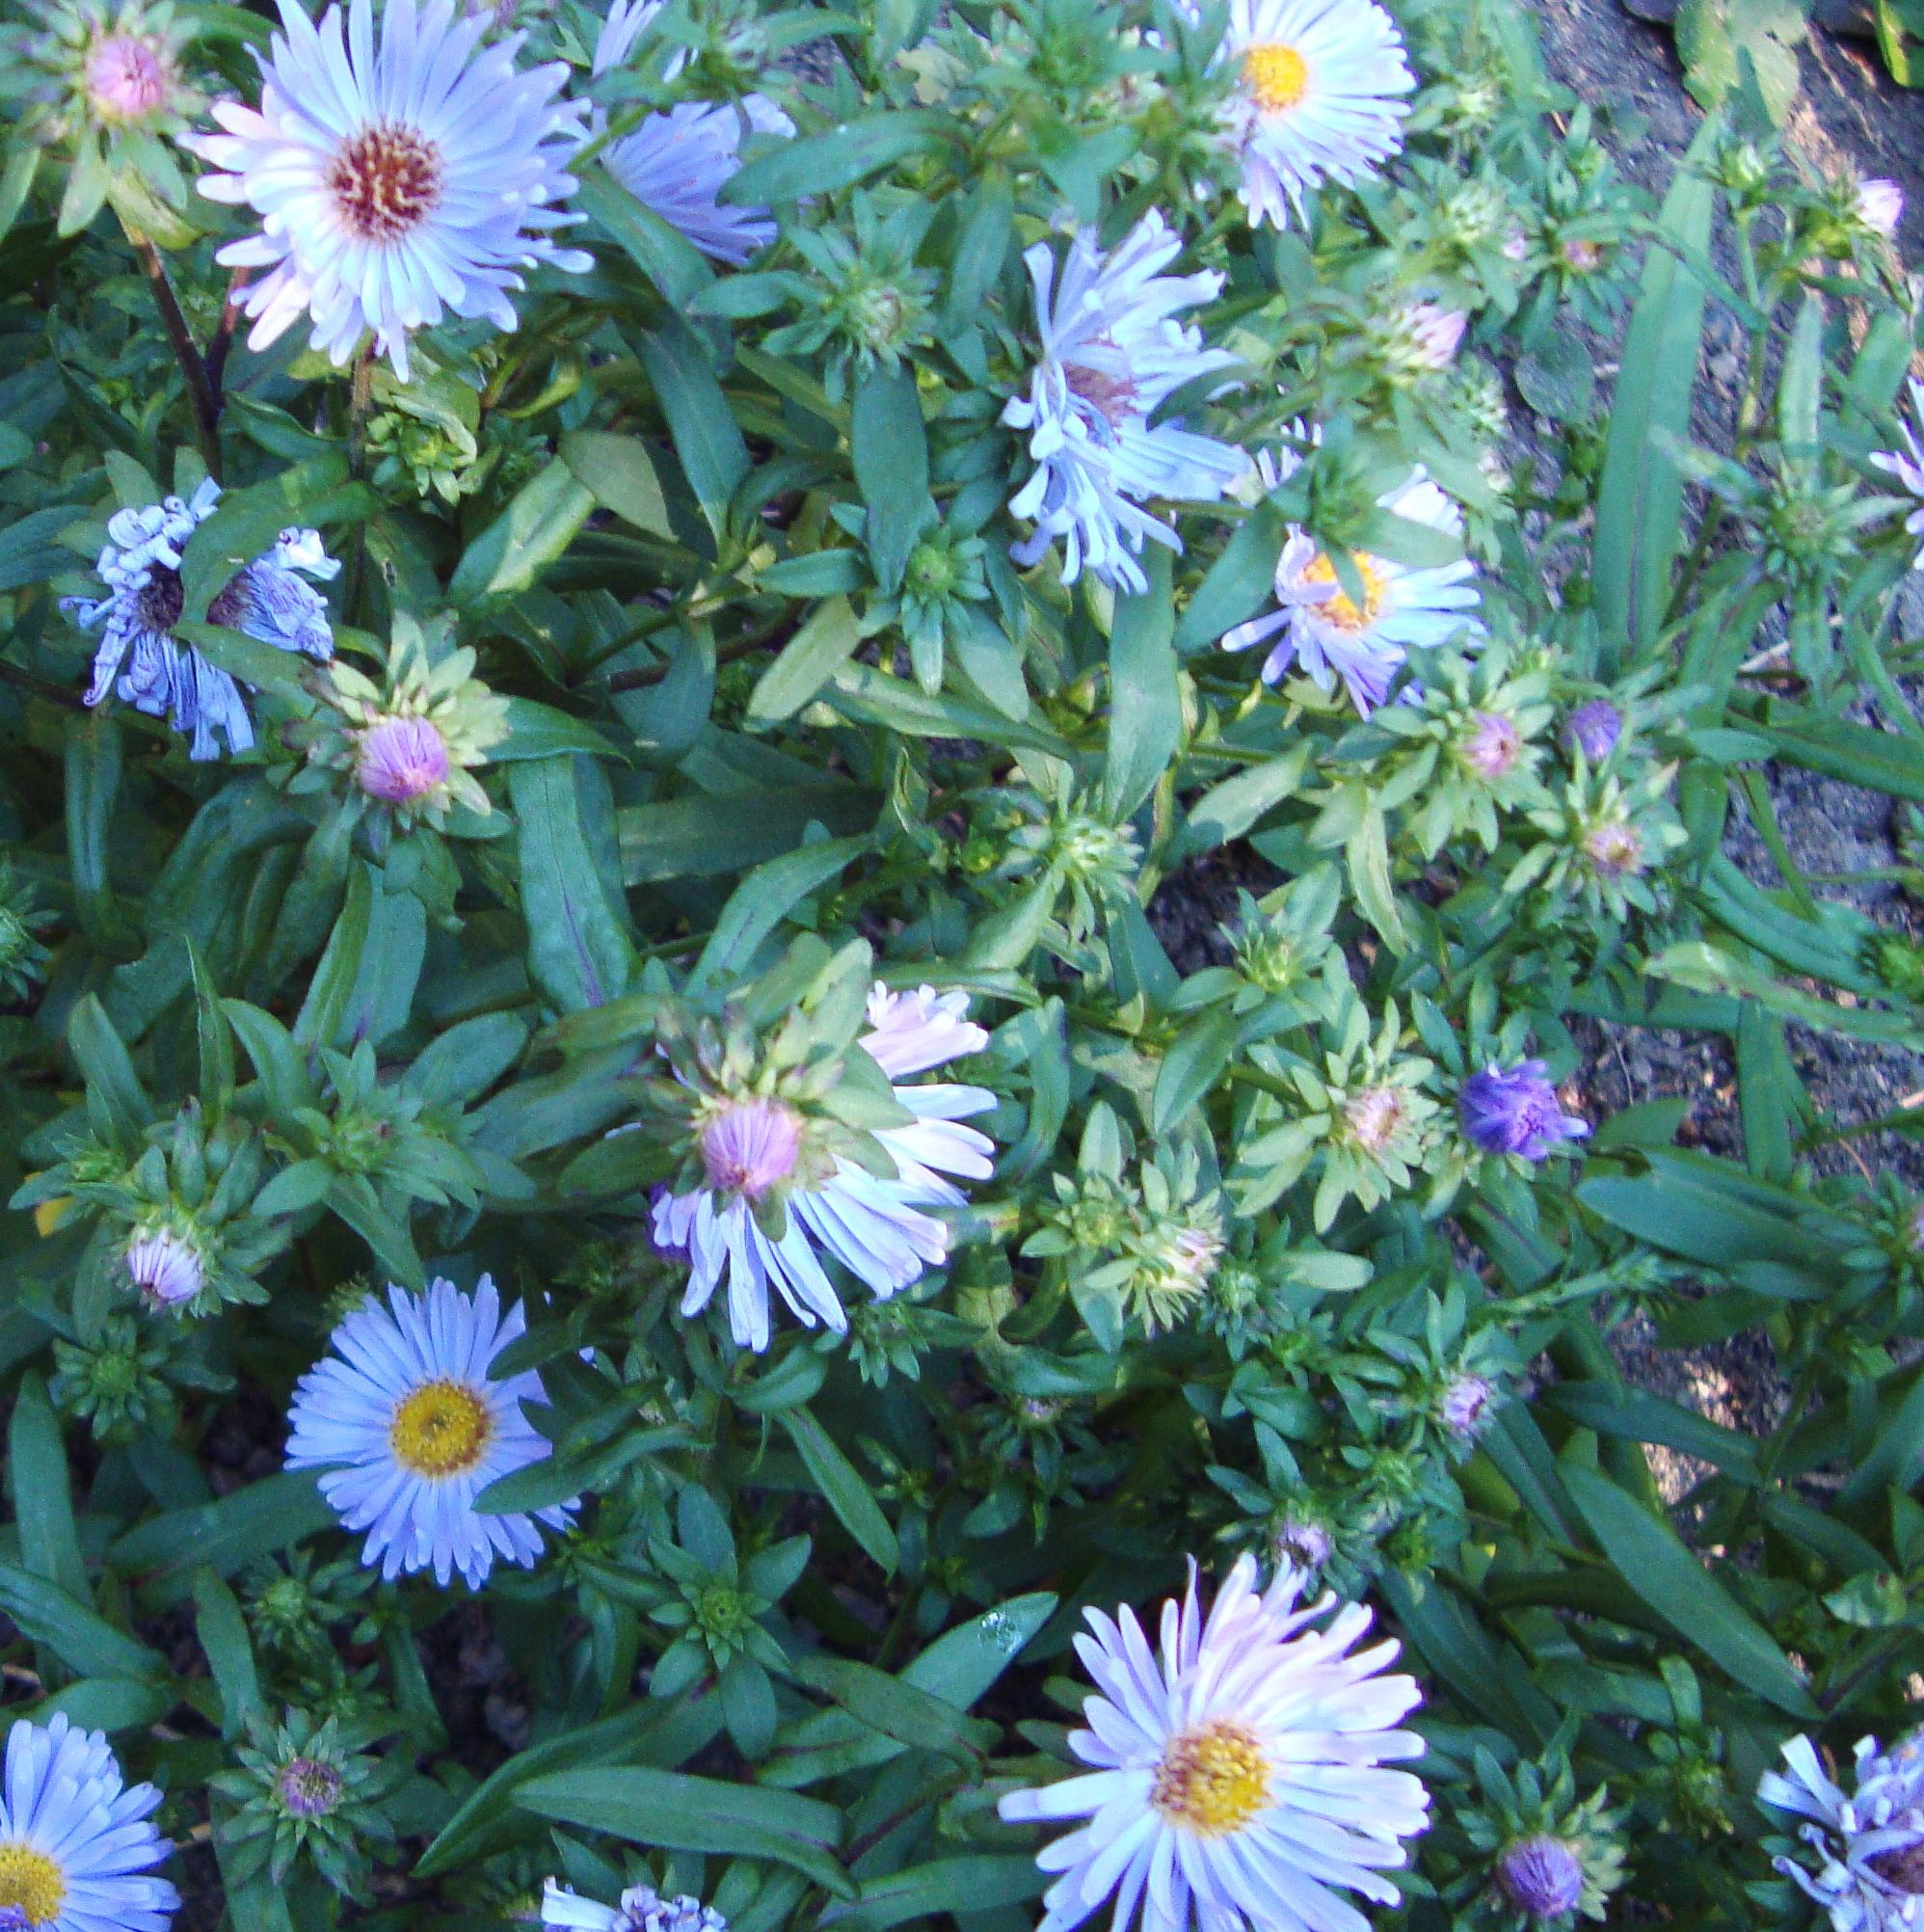 Michaelmas daisy flower essence flower essences flower remedies michaelmas daisy flower essence izmirmasajfo Image collections